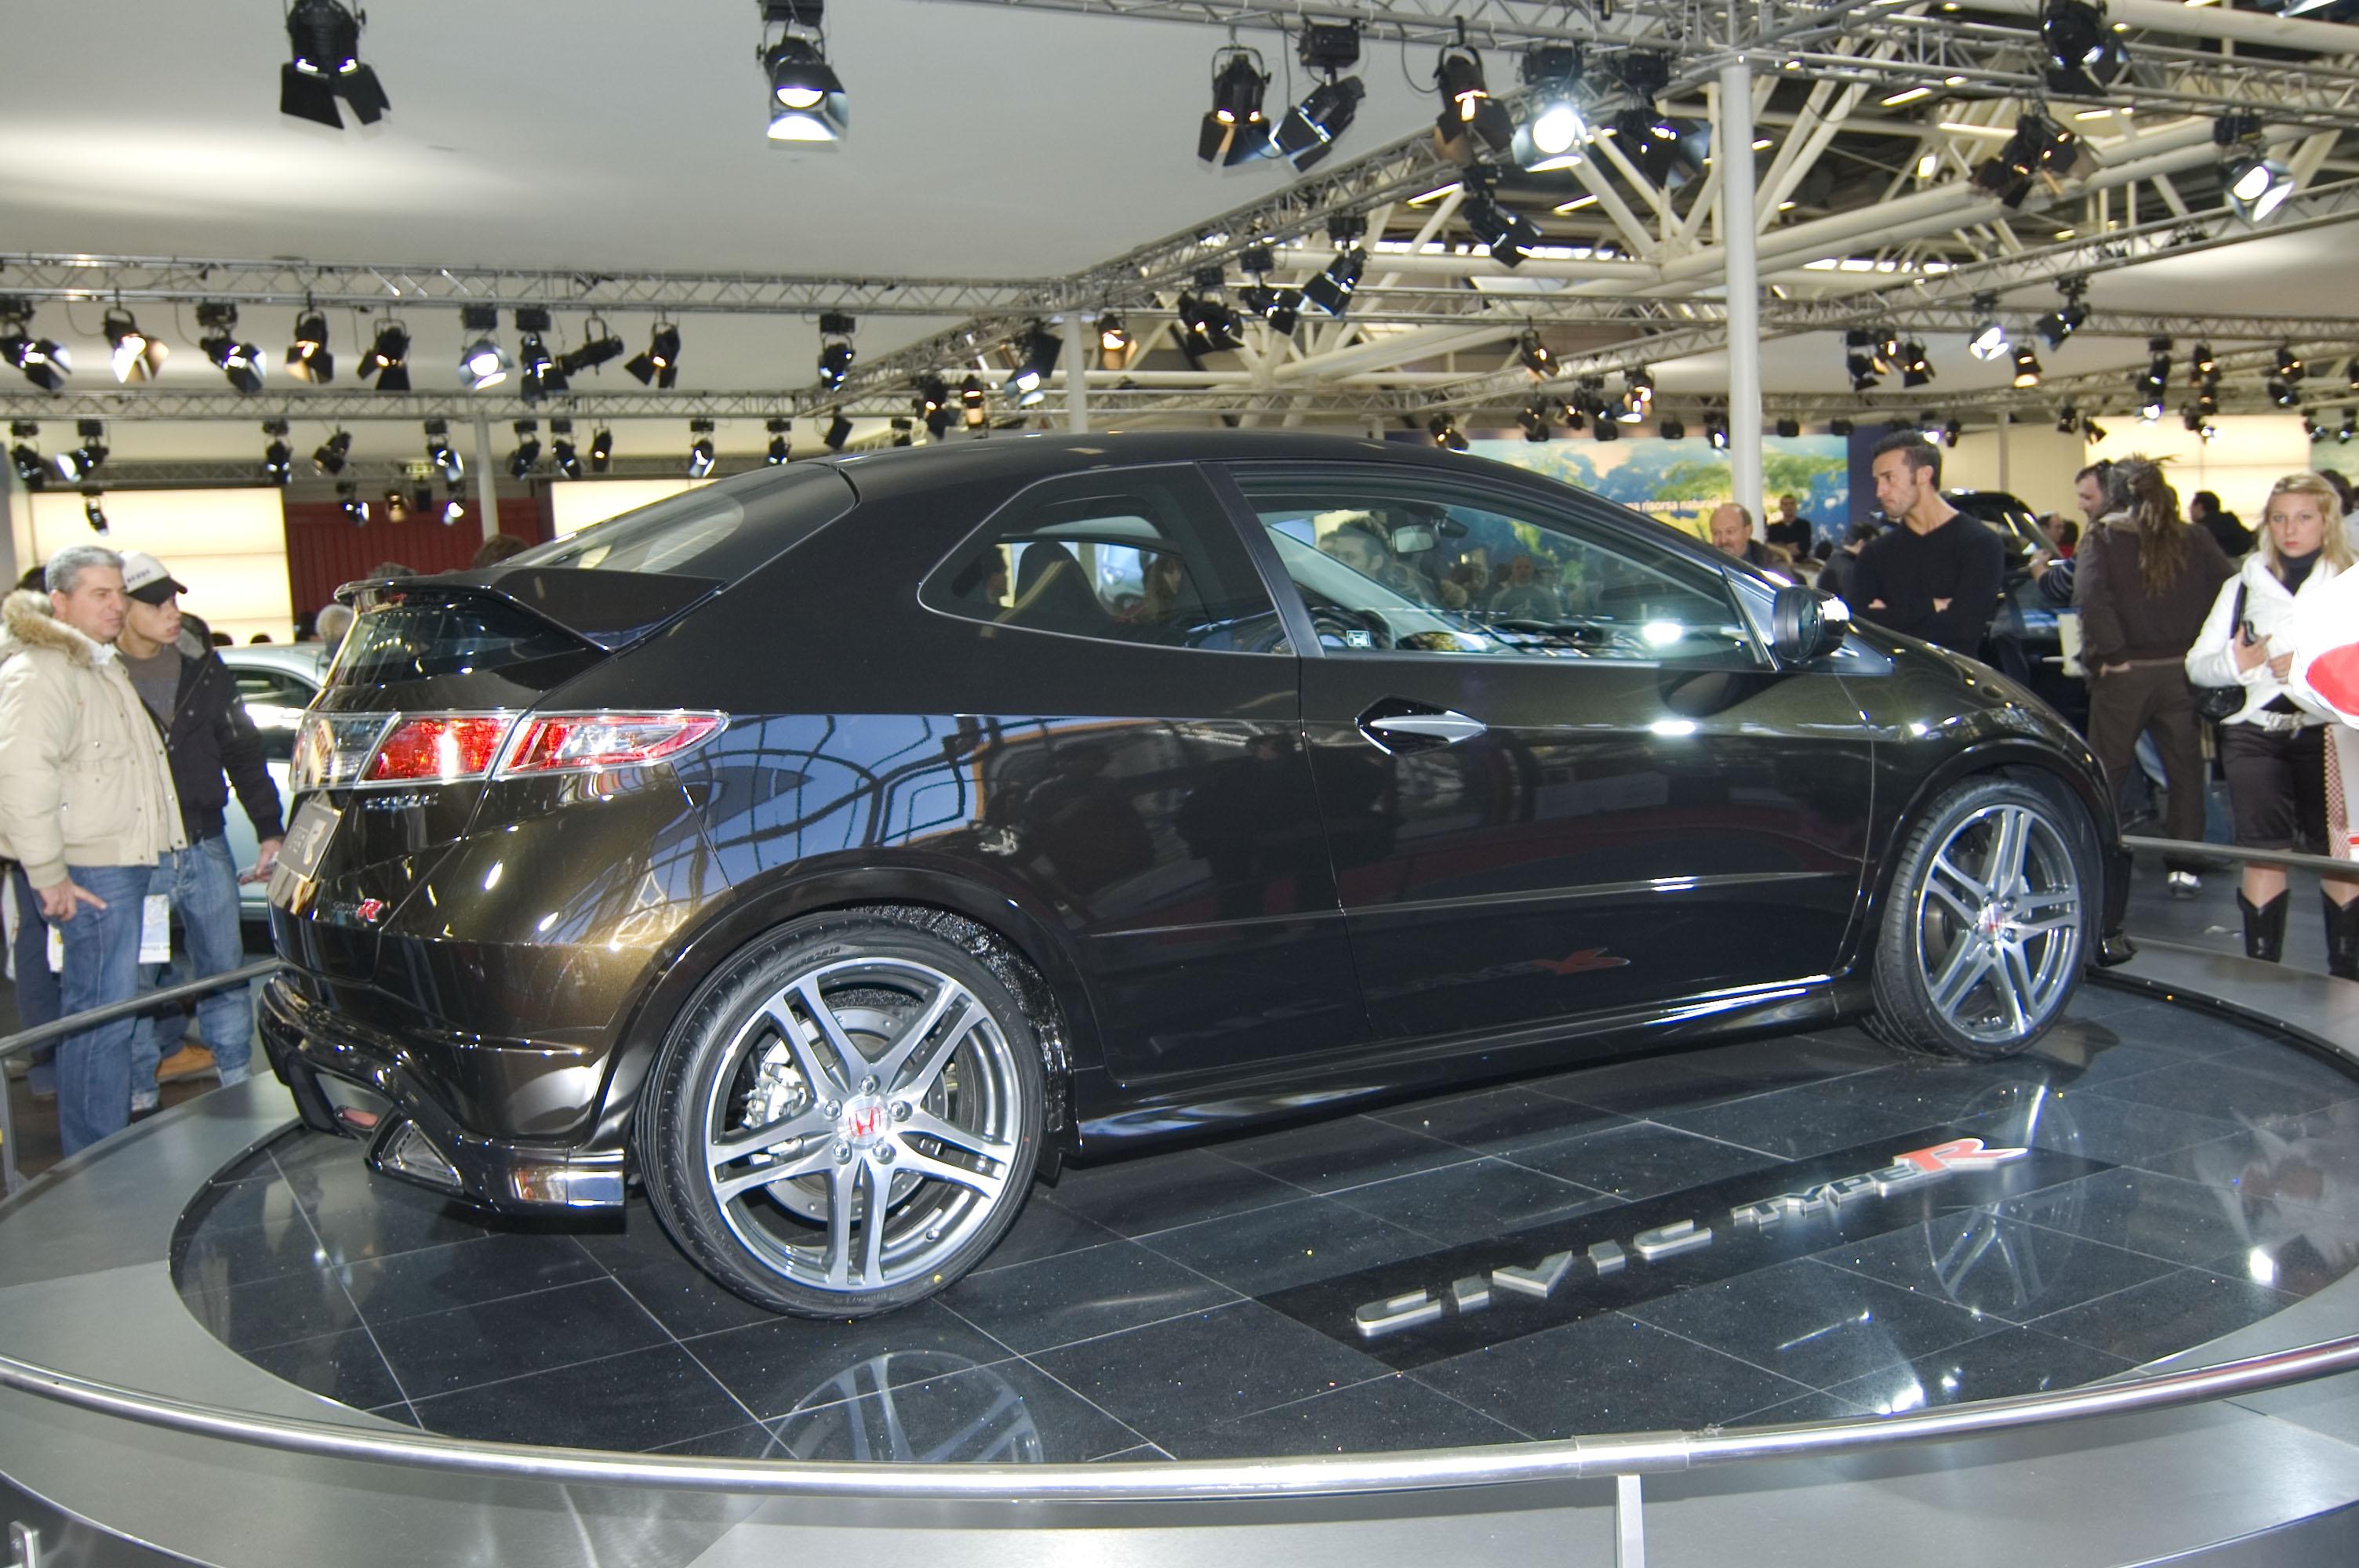 File:Motor Show 2007, Honda Civic TypeR - Flickr - Gaspa.jpg - Wikimedia Commons